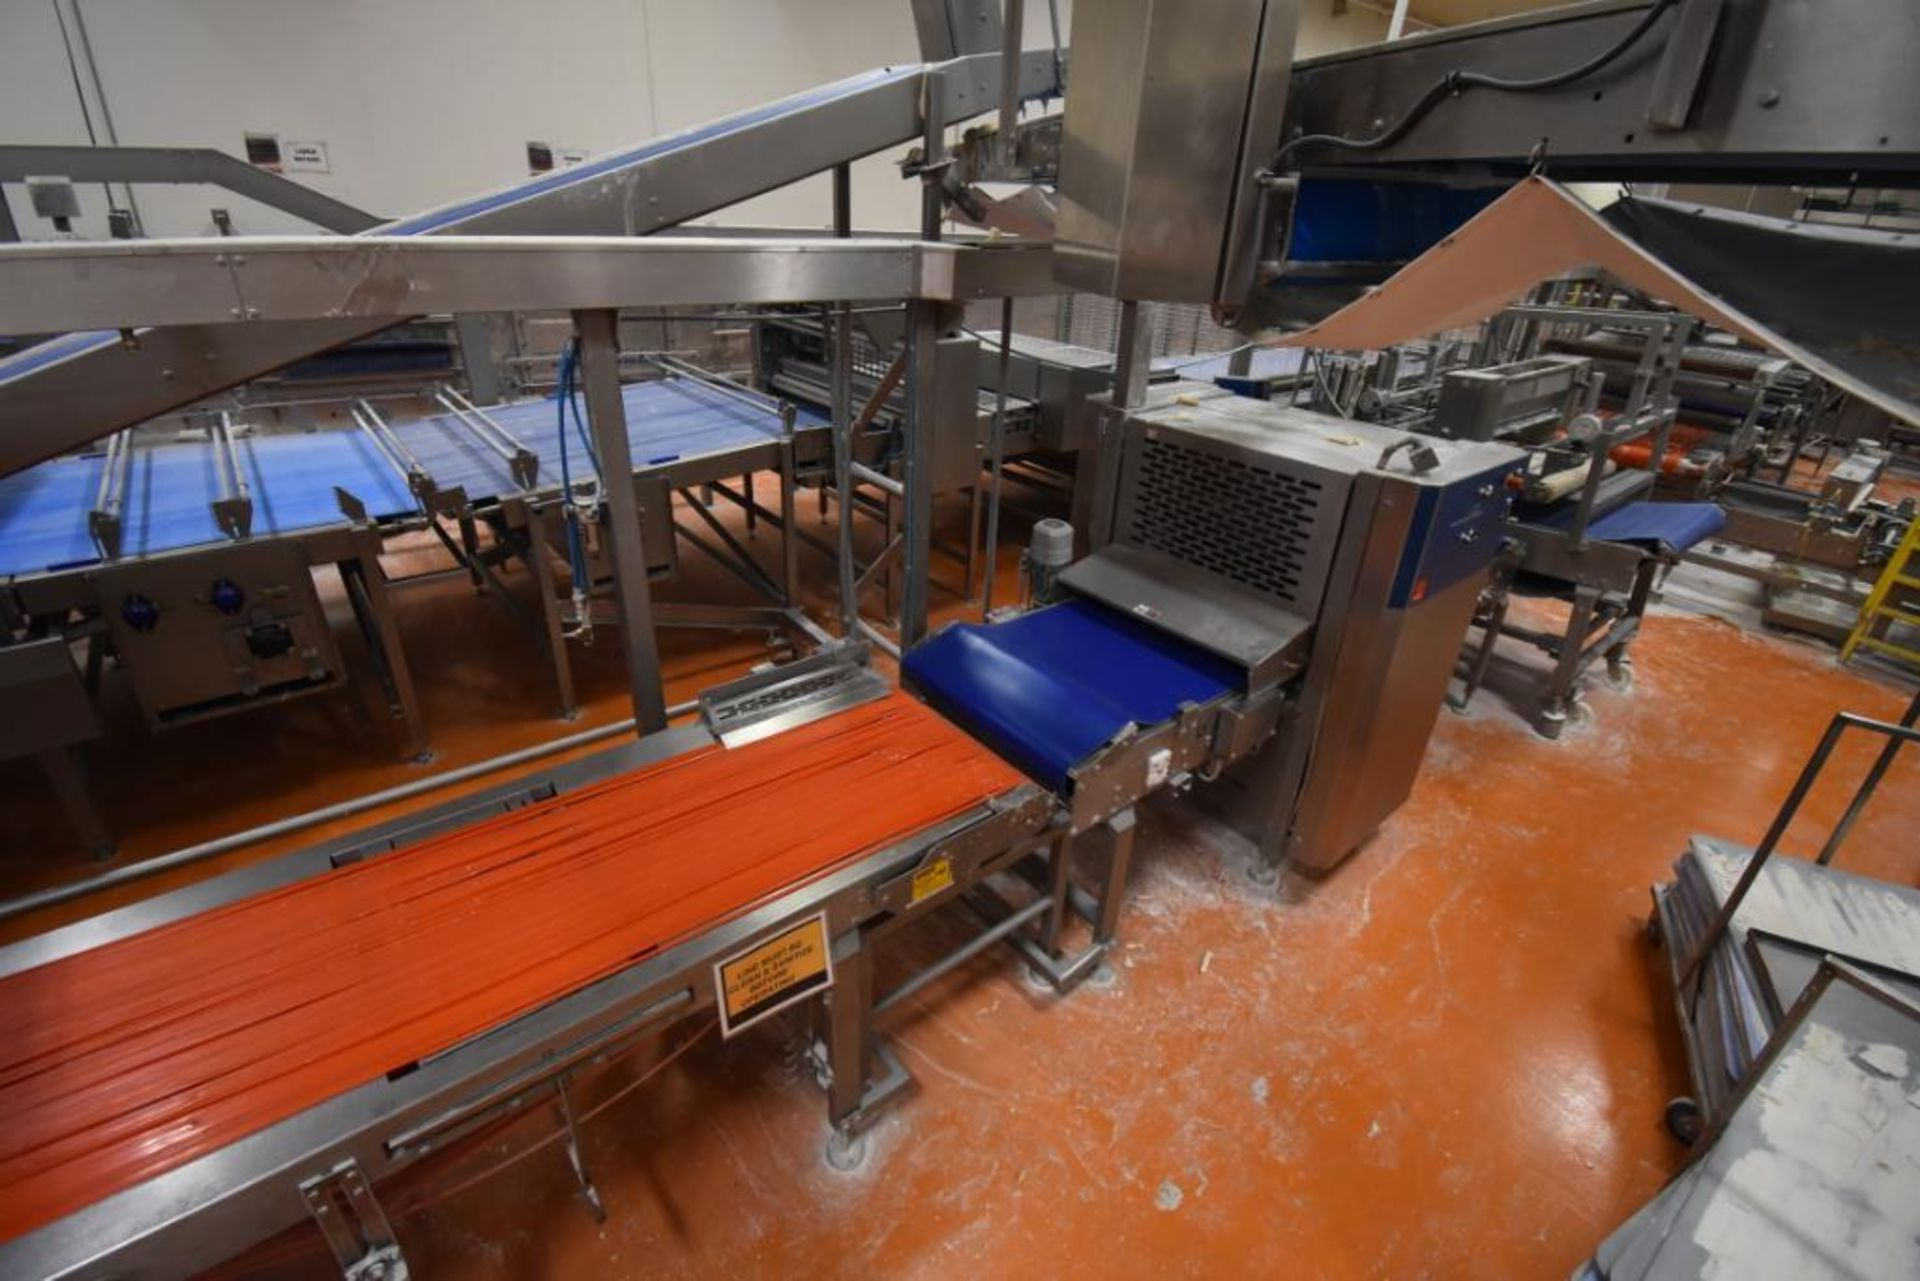 2007 Fritsch Laminator 3000 dough line - Image 269 of 280